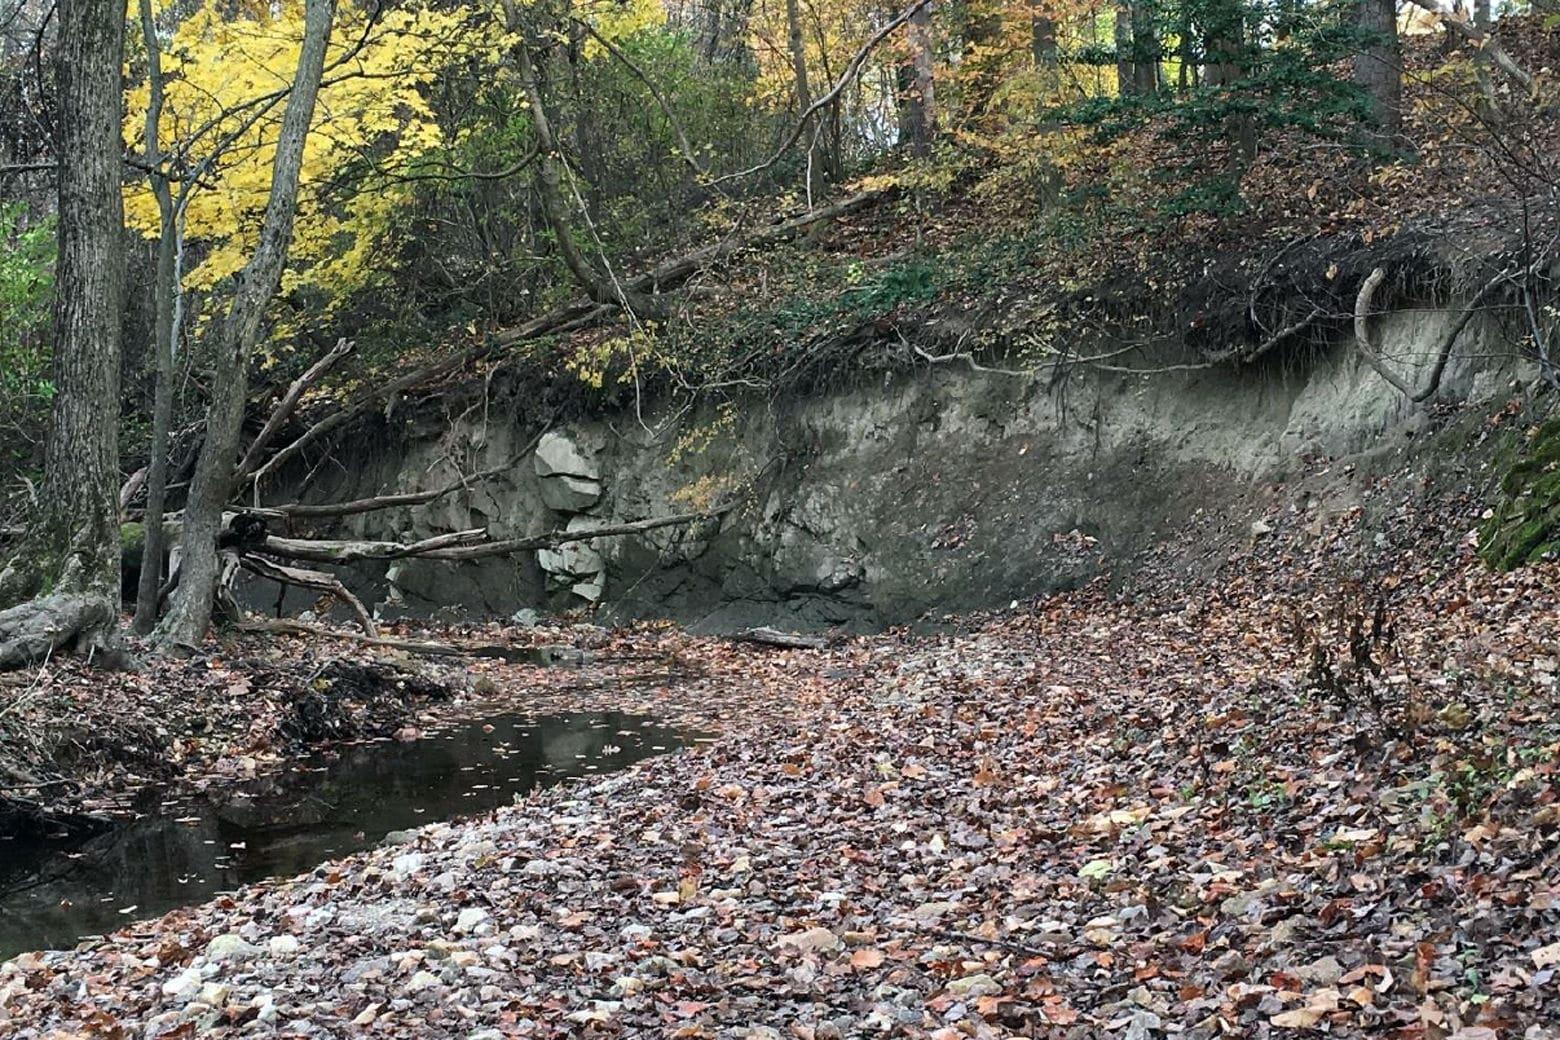 Bank erosion at Pinehurst Branch. (Courtesy Cathy Wiss)